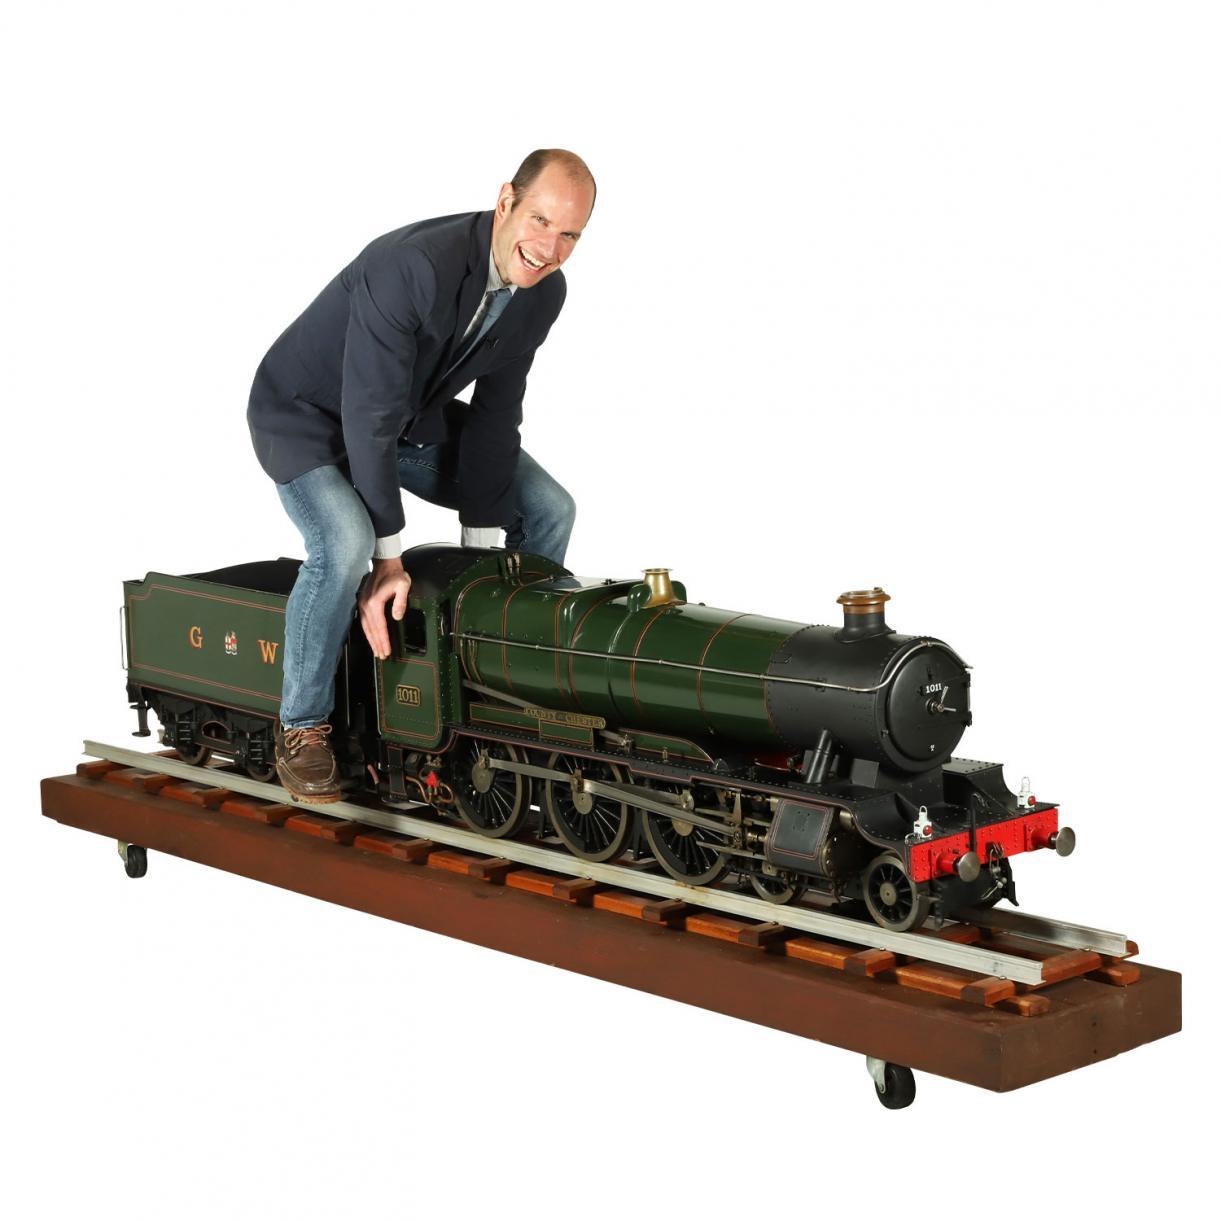 7 ¼ inch gauge model of the Great Western Railway